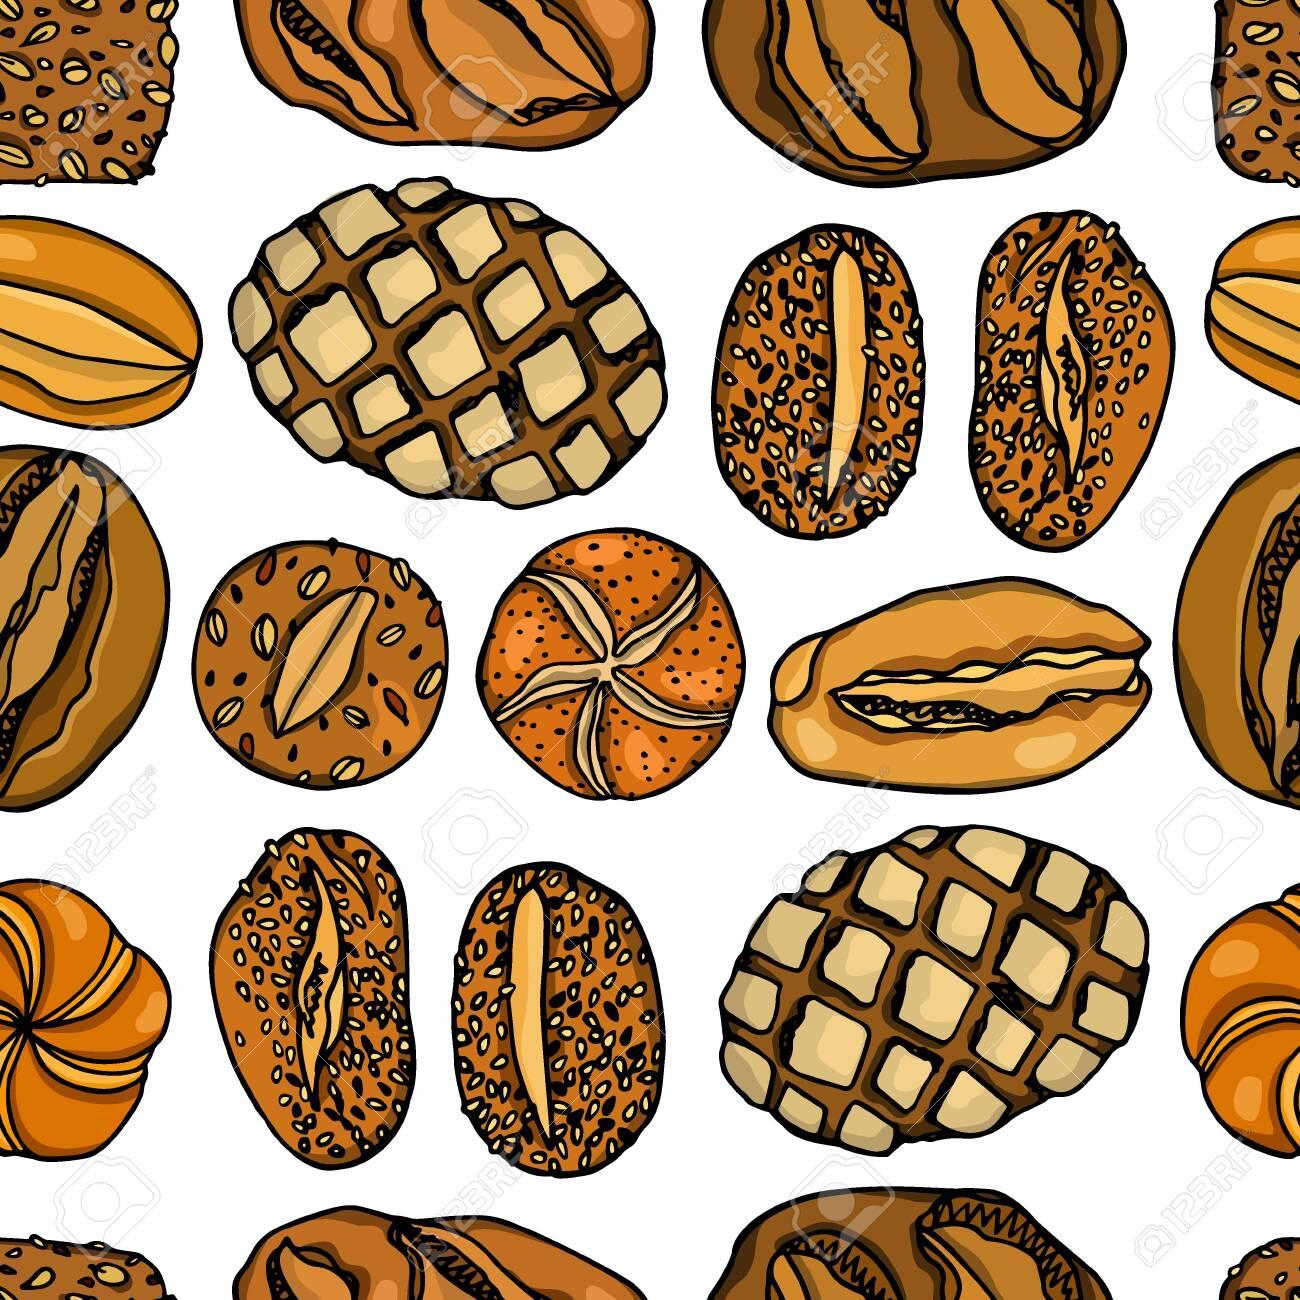 Hand drawn German bread pattern - 136320186